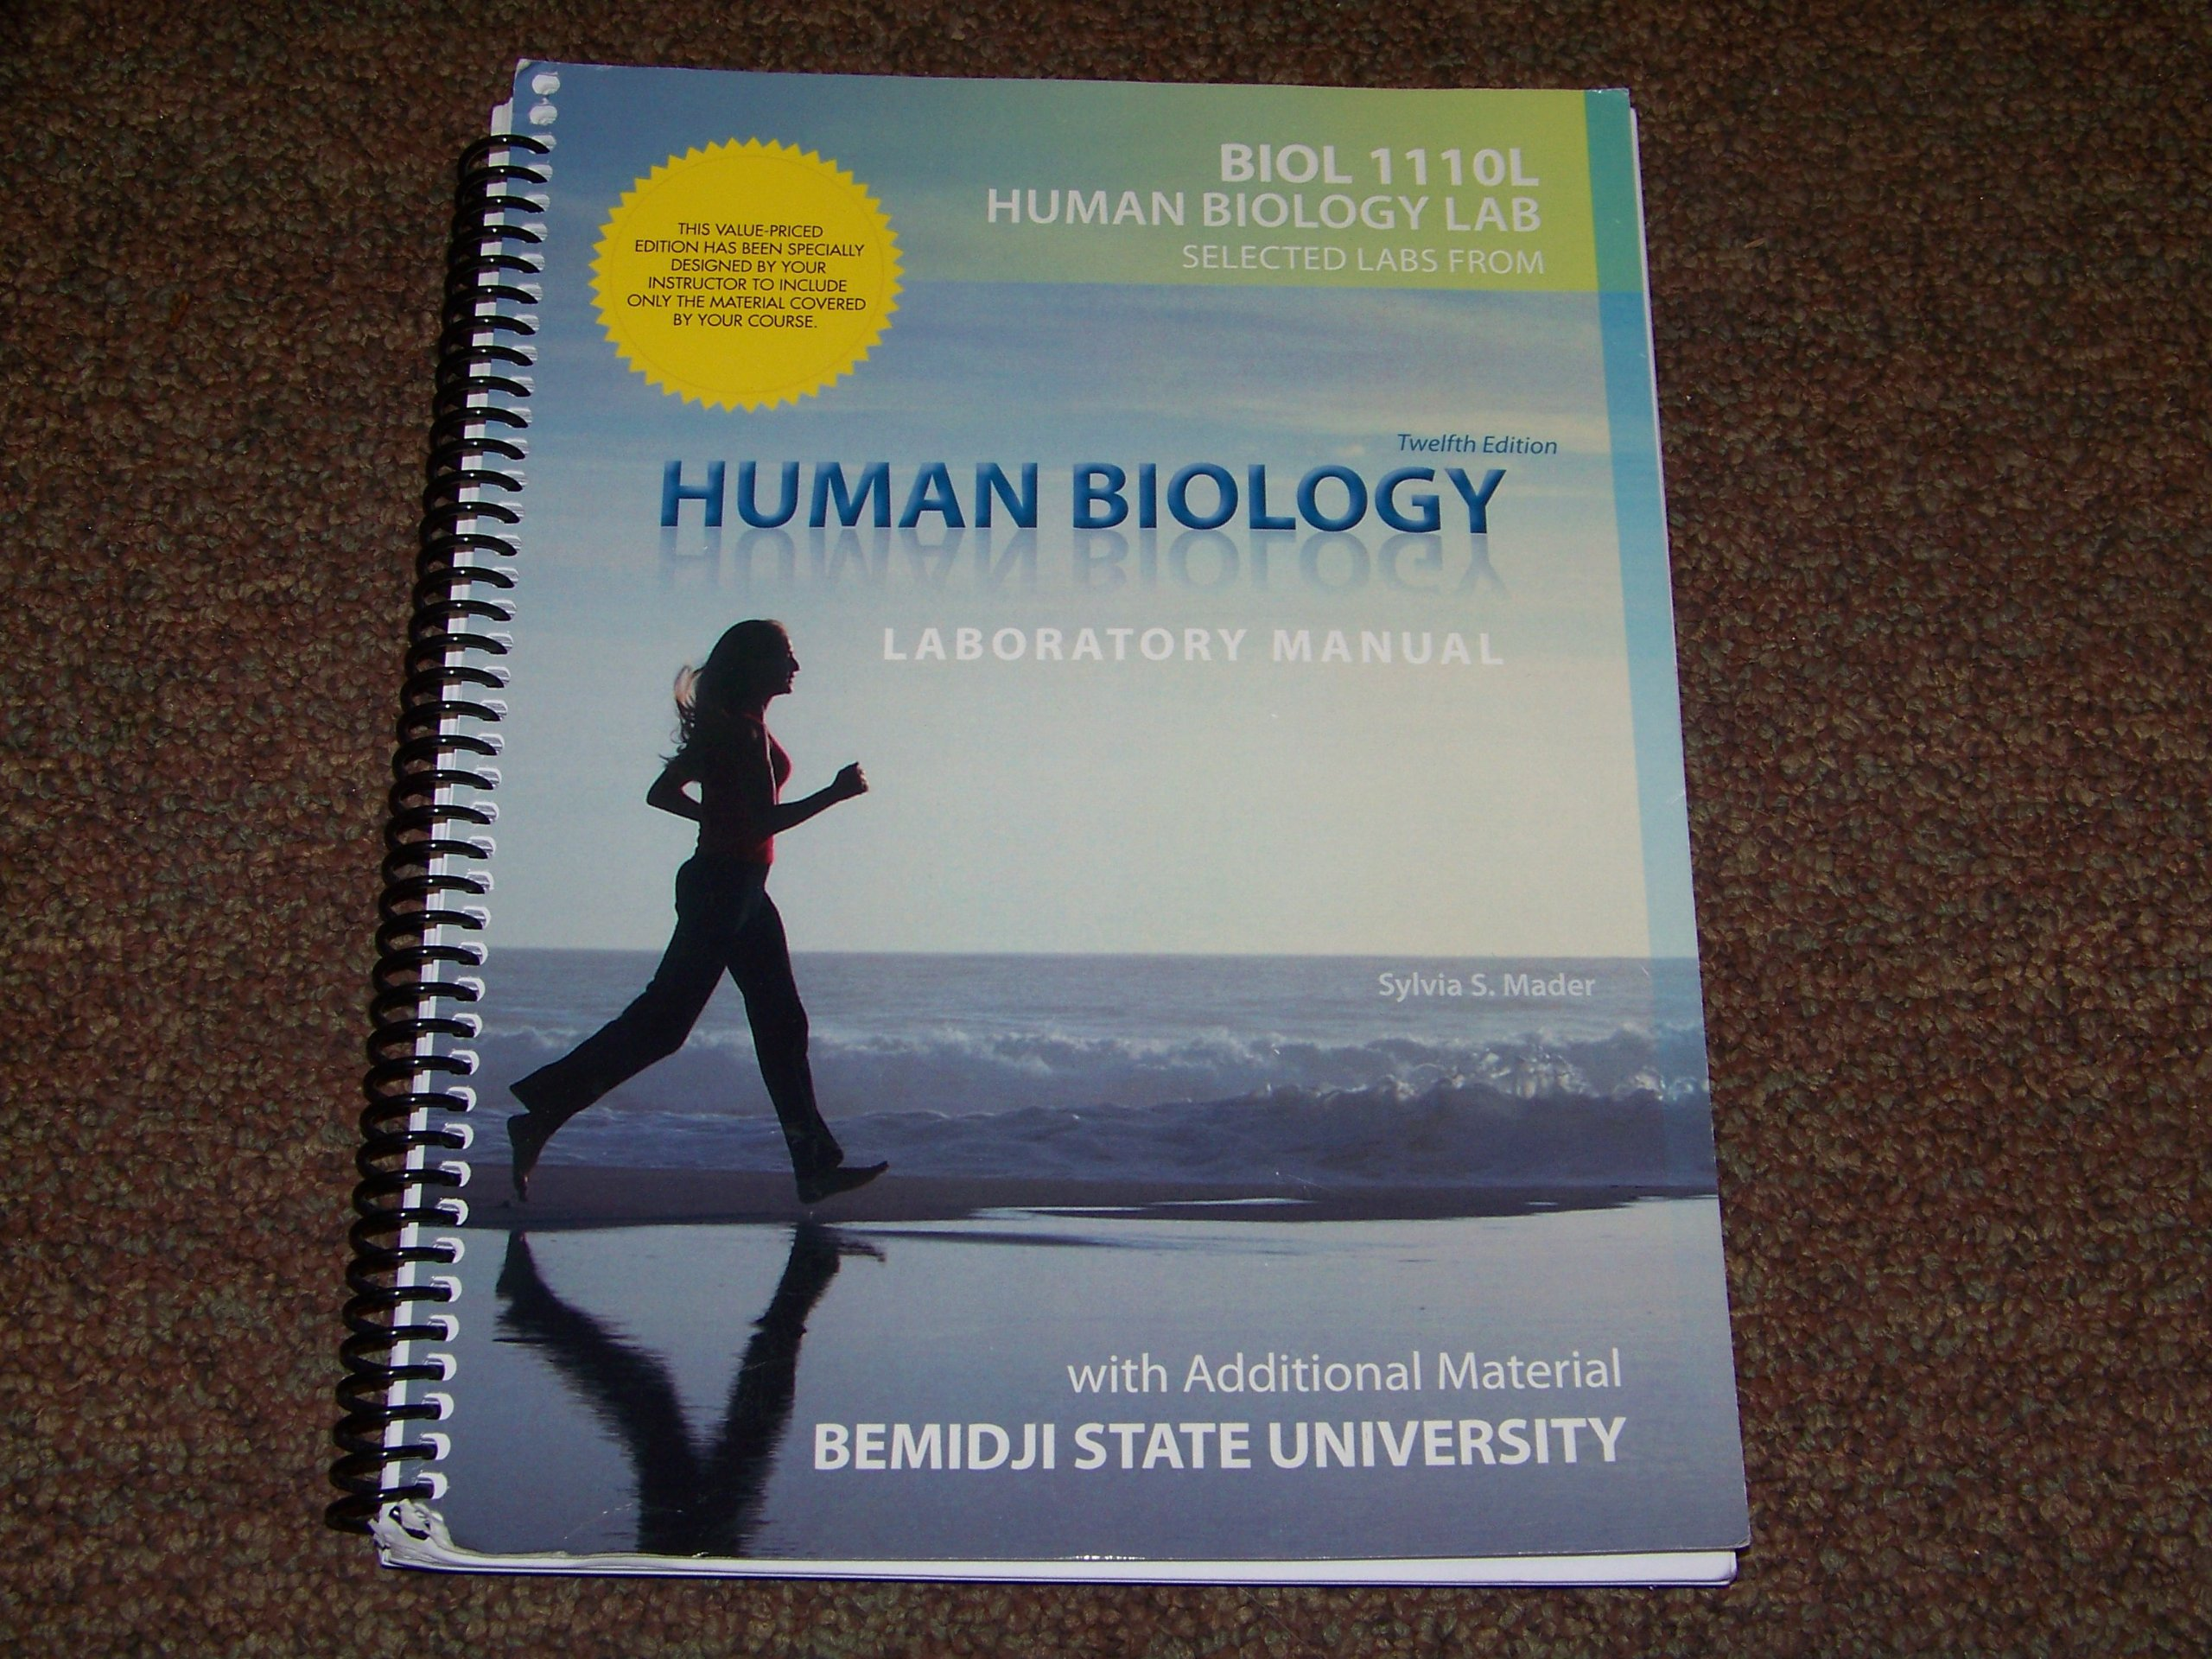 Human Biology Laboratory Manual: With Additional Material Bemidji State  University: Sylvia S. Mader: 9780077693497: Amazon.com: Books